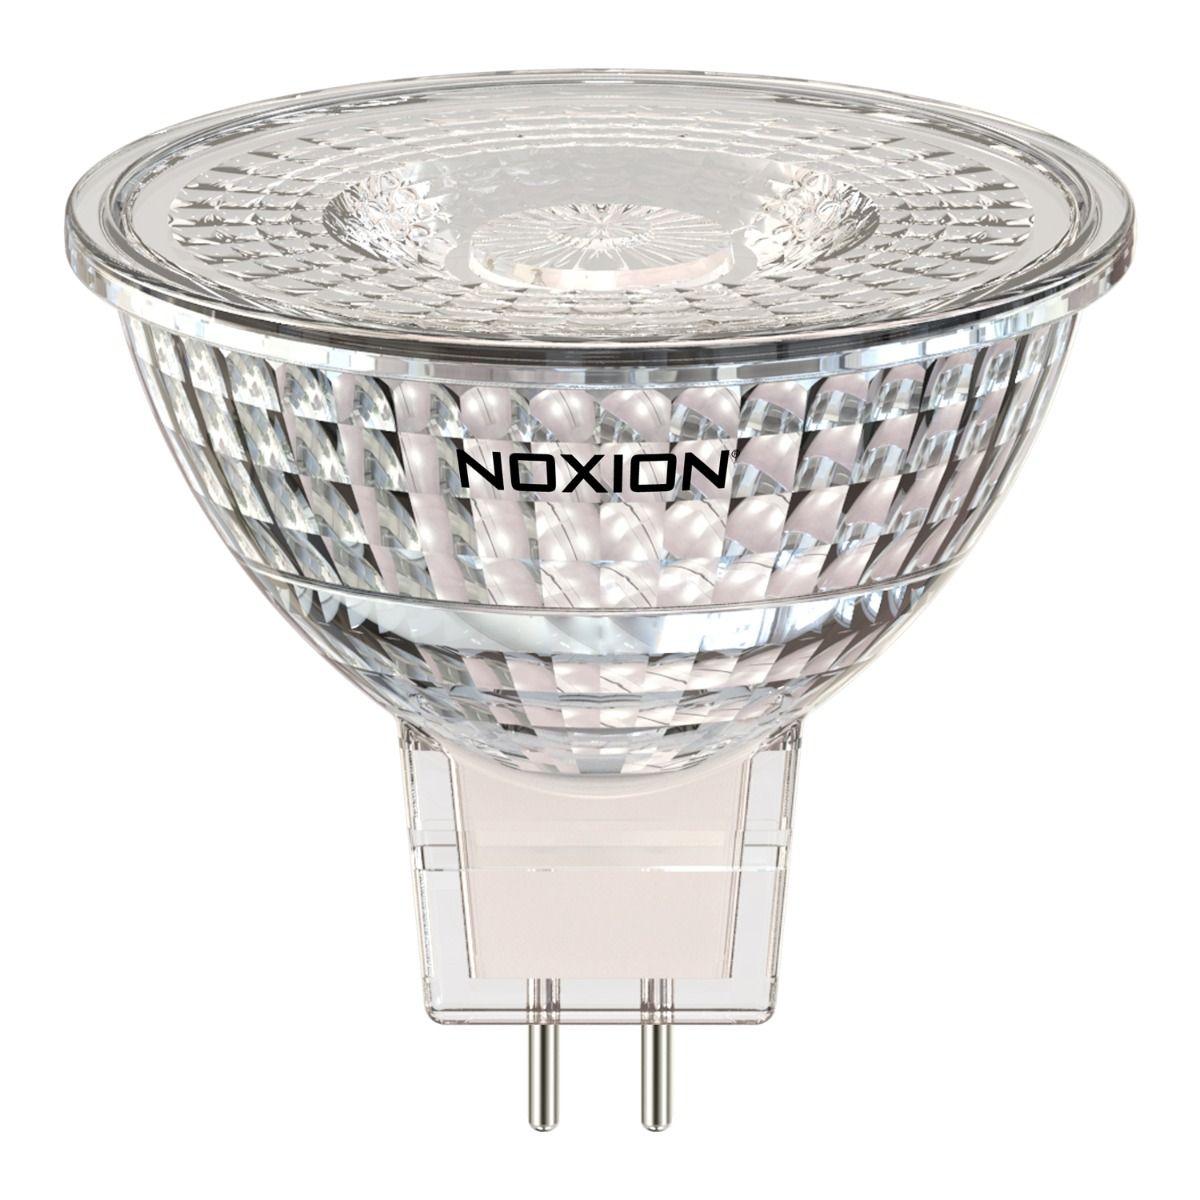 Noxion LED Spot GU5.3 5W 830 36D 470lm | Dimbaar - Warm Wit - Vervangt 35W